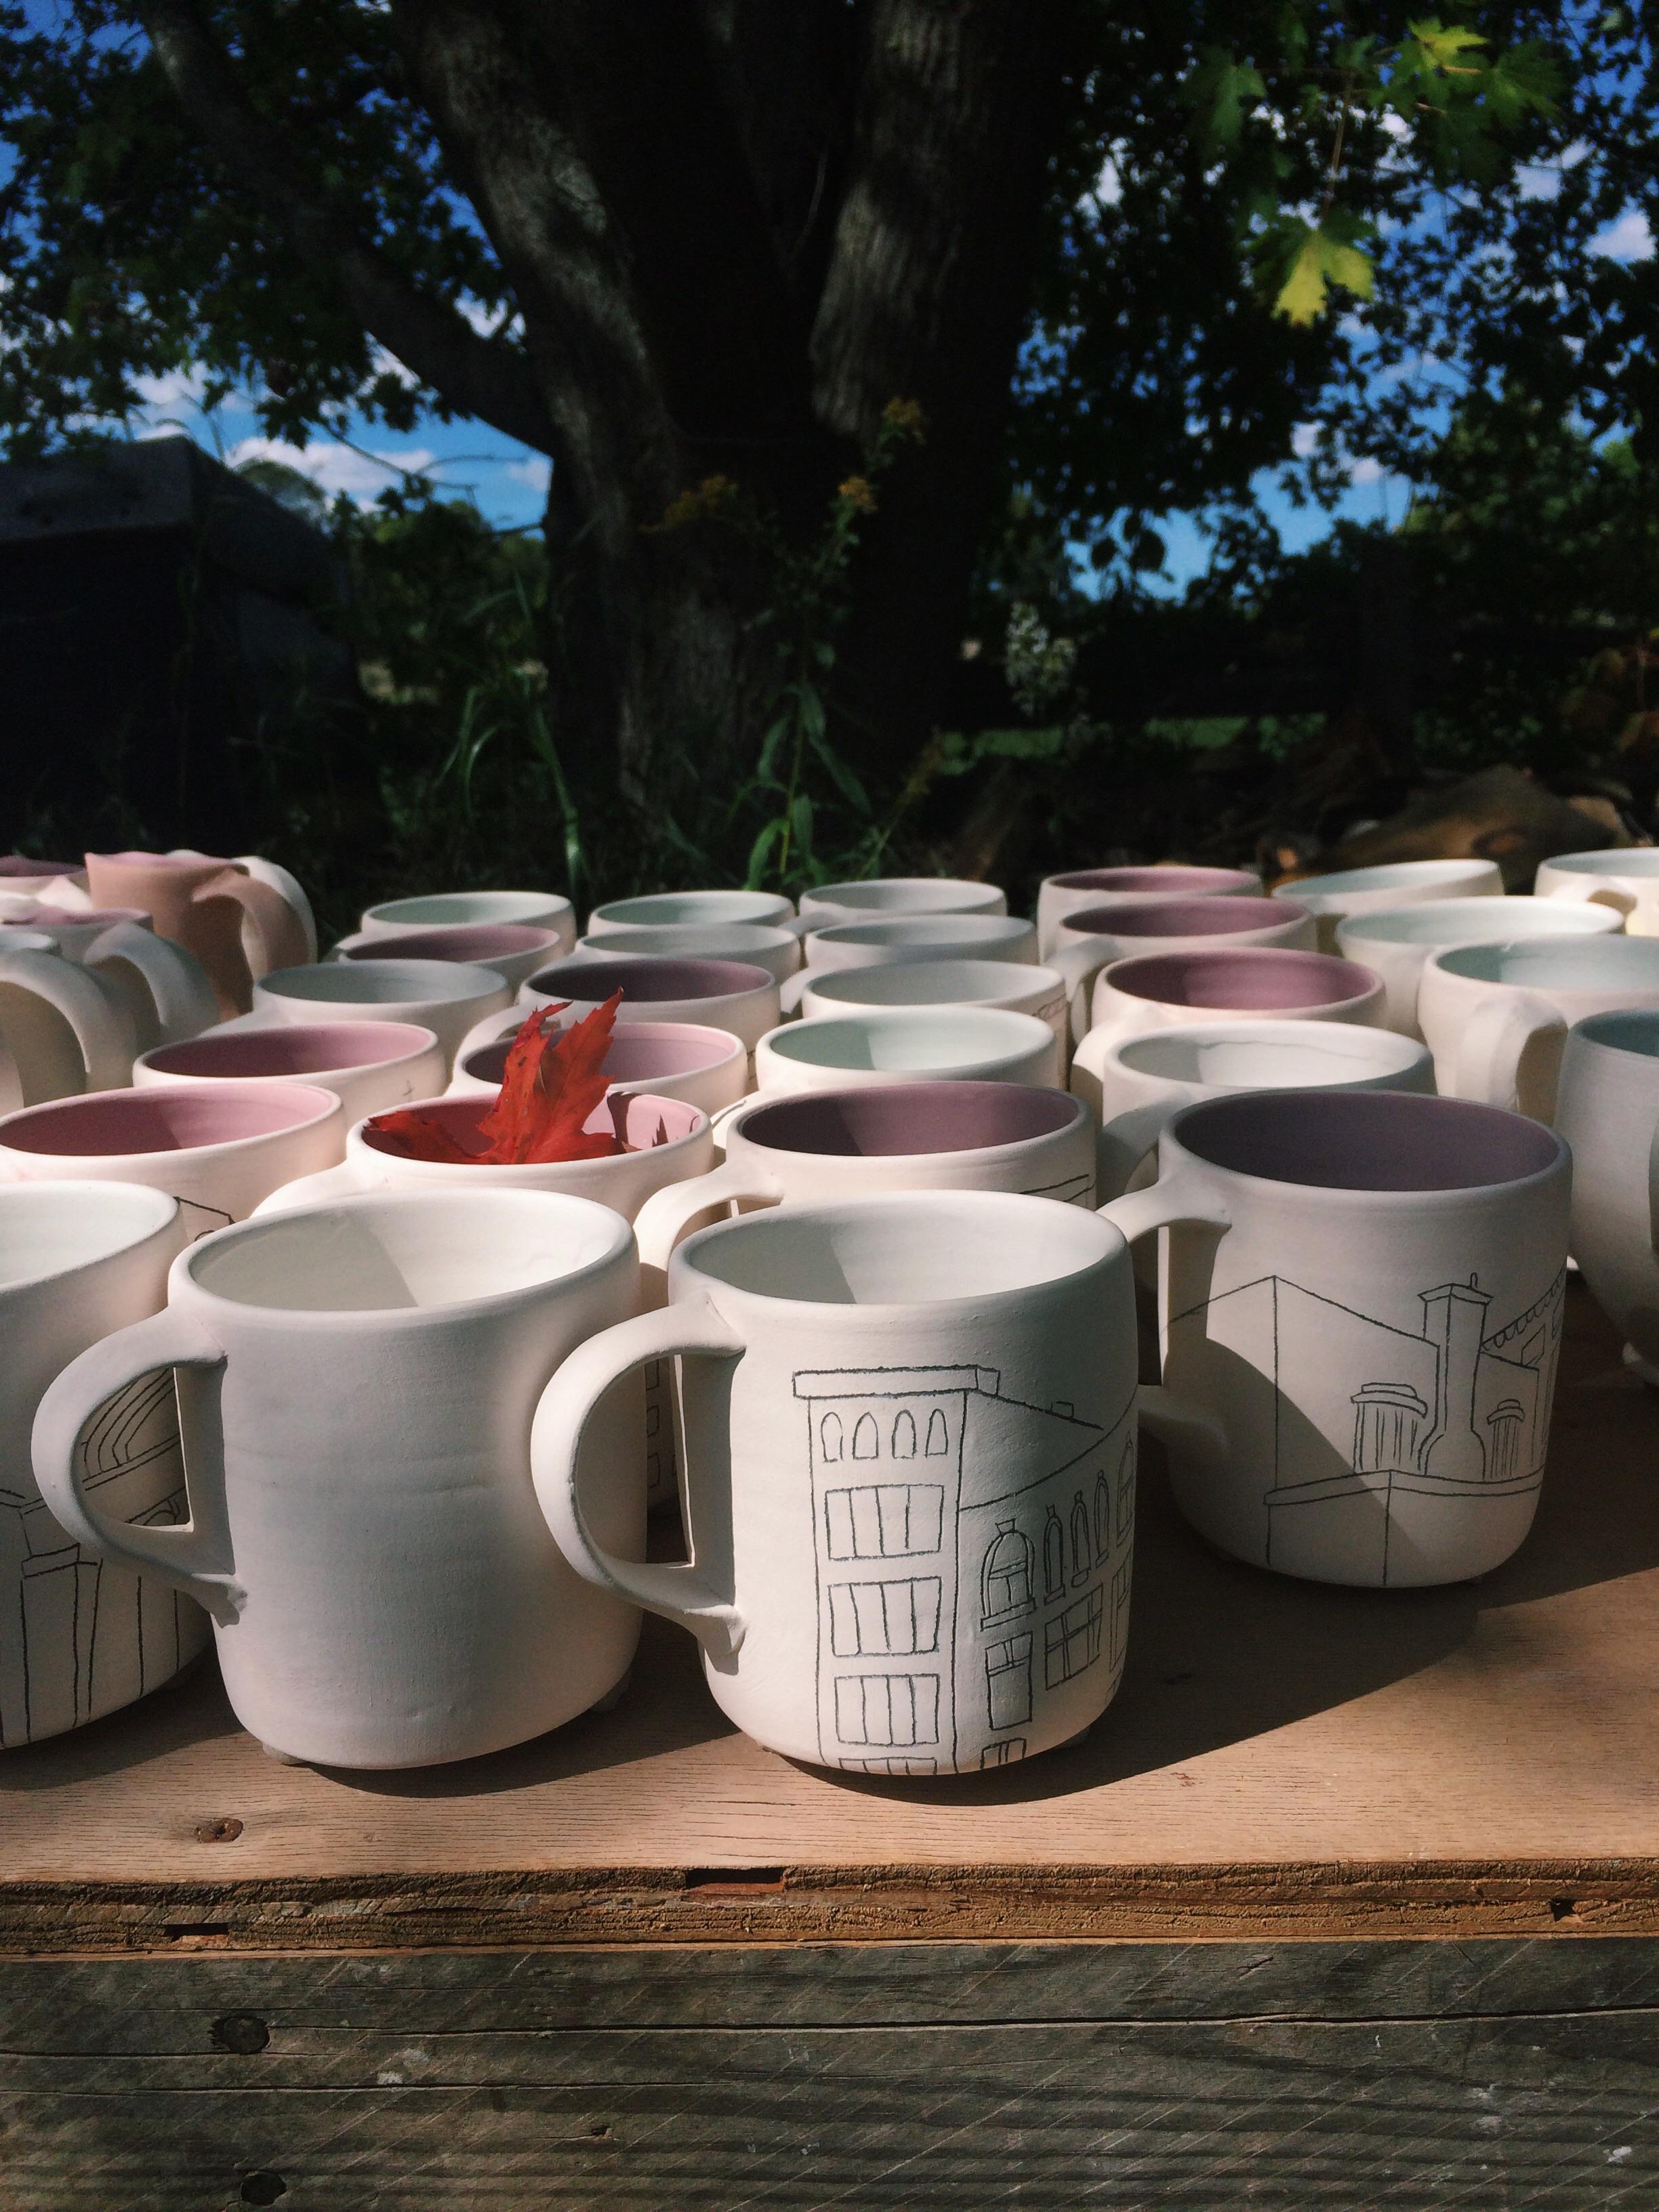 Hamilton mugs!